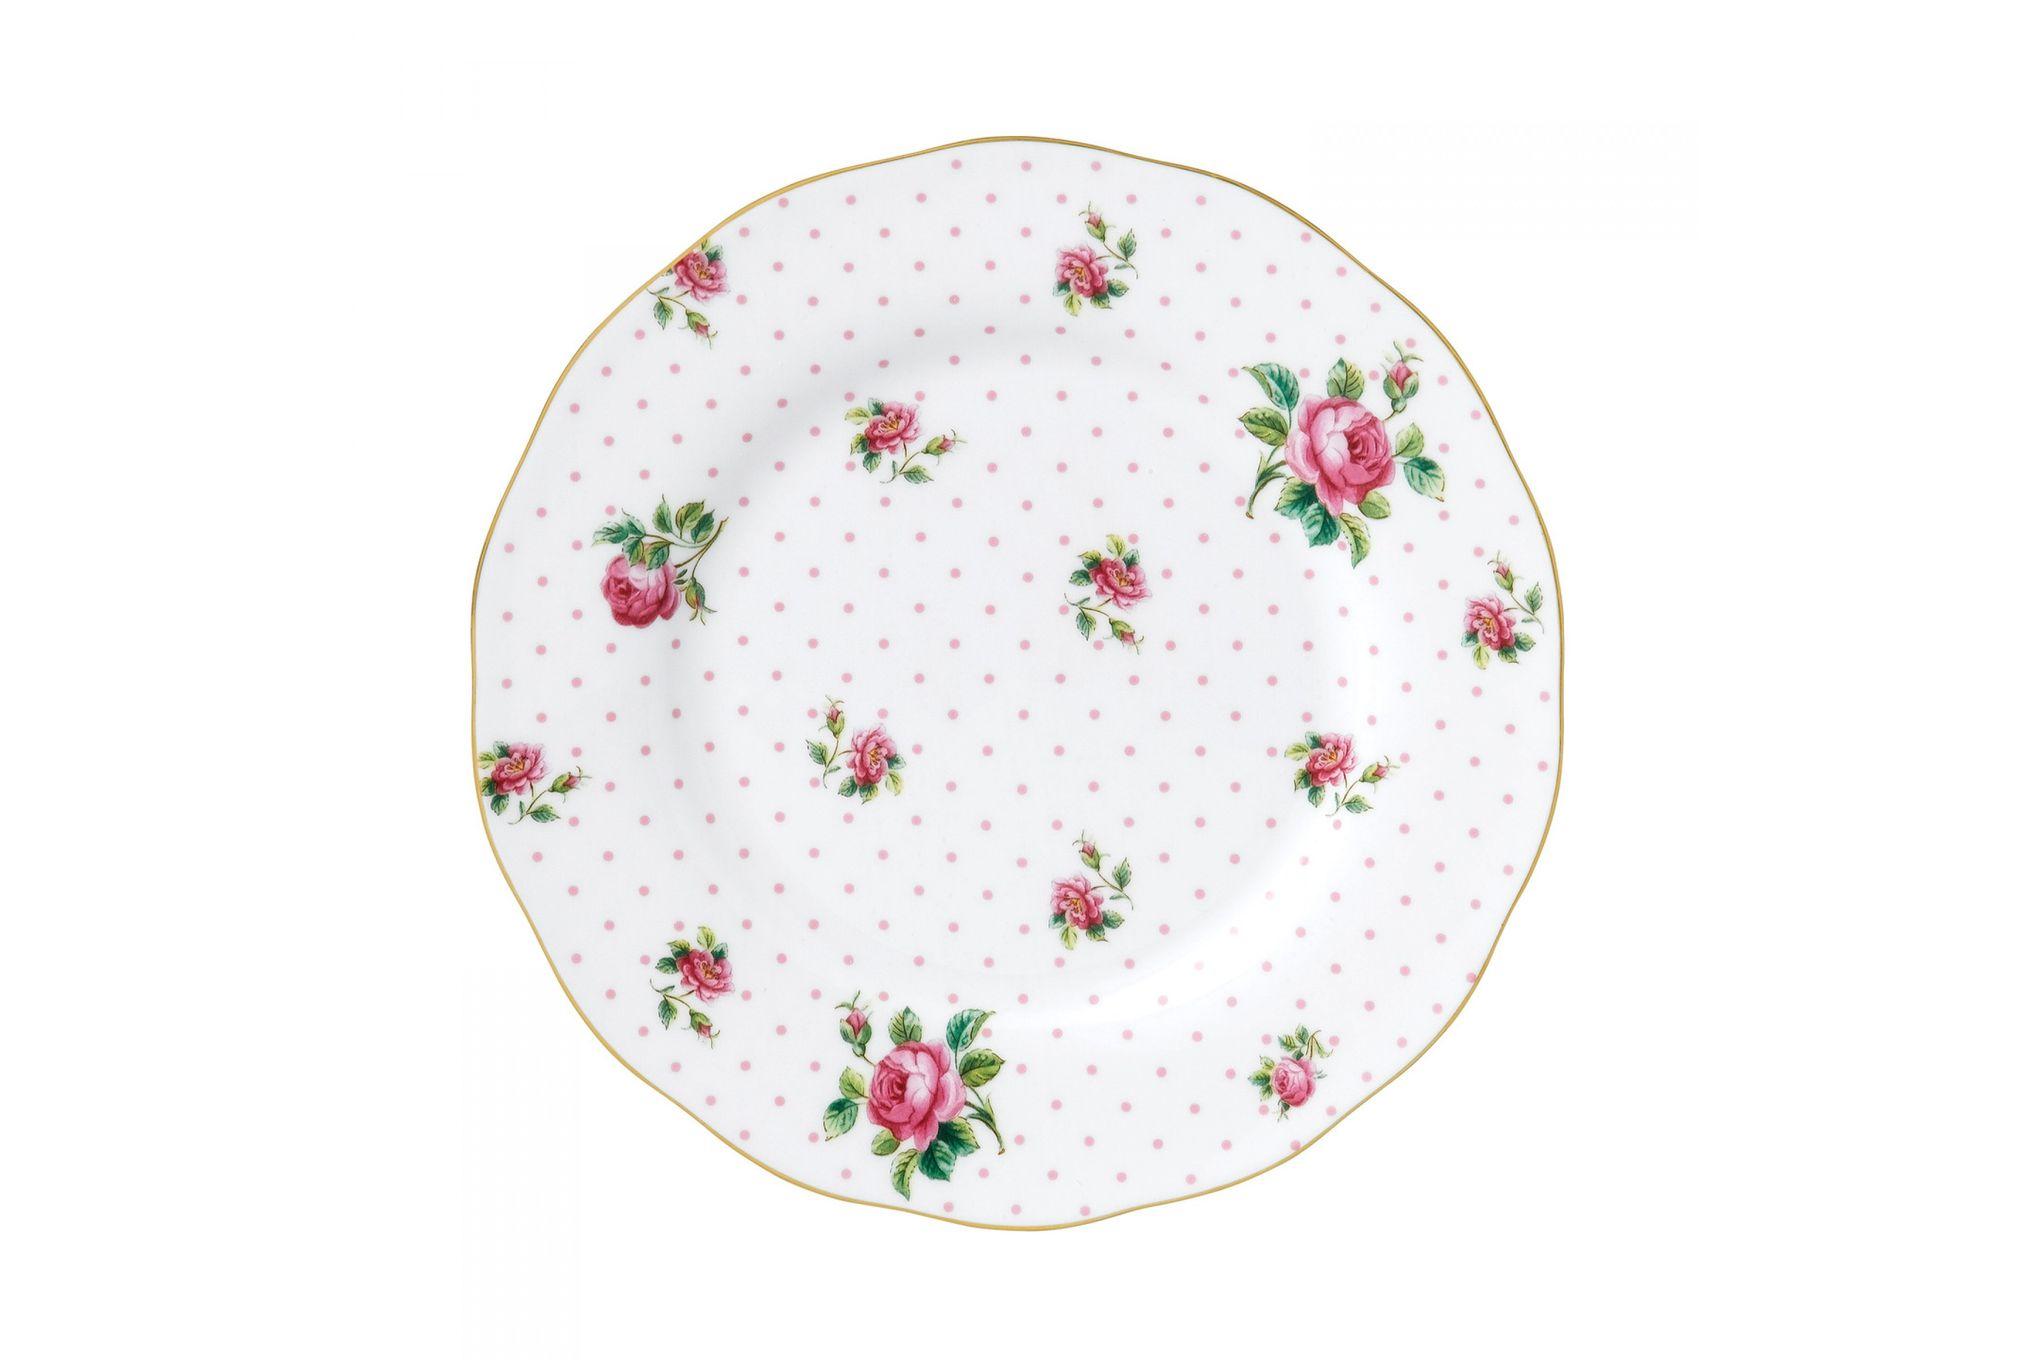 Royal Albert Cheeky Pink Starter / Salad / Dessert Plate Vintage Shape 20cm thumb 1